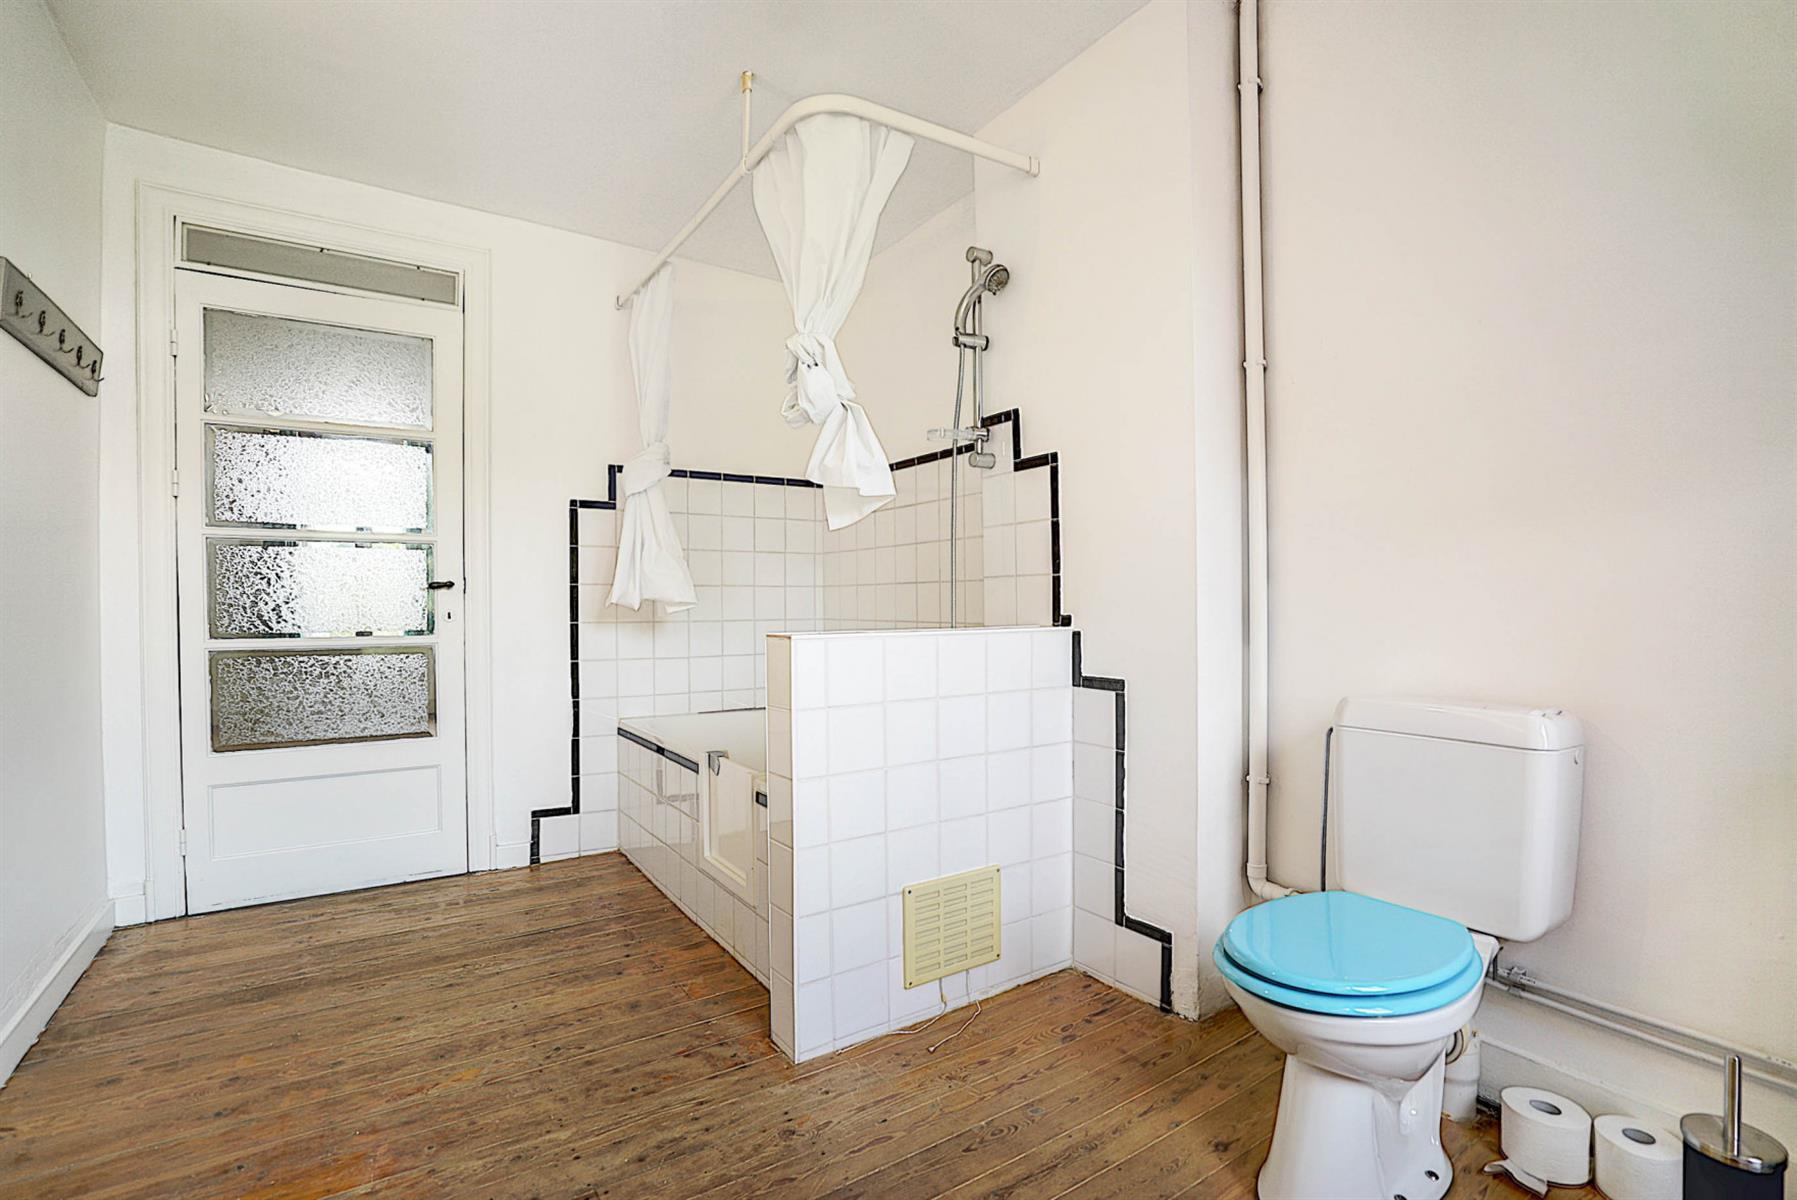 Maison - Bousval - #4131618-15